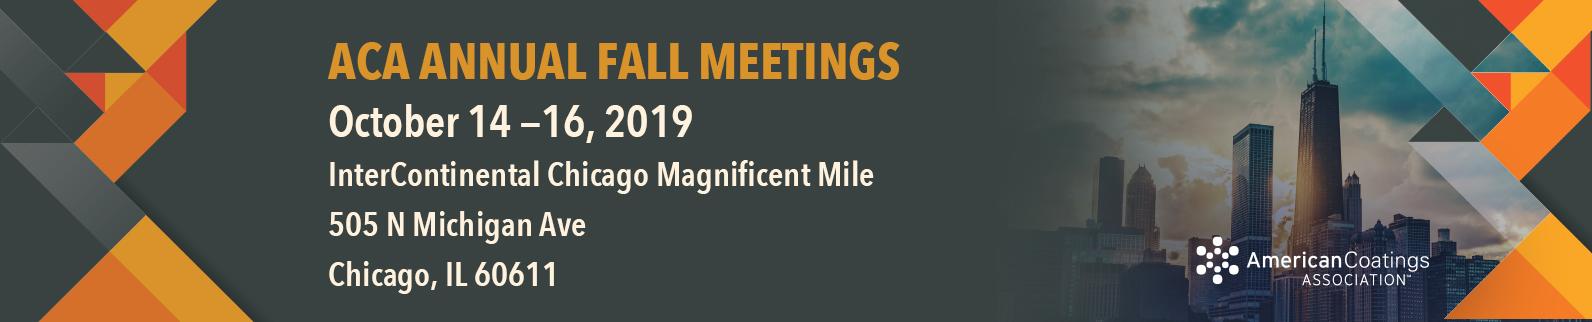 ACA Annual Fall Meeting